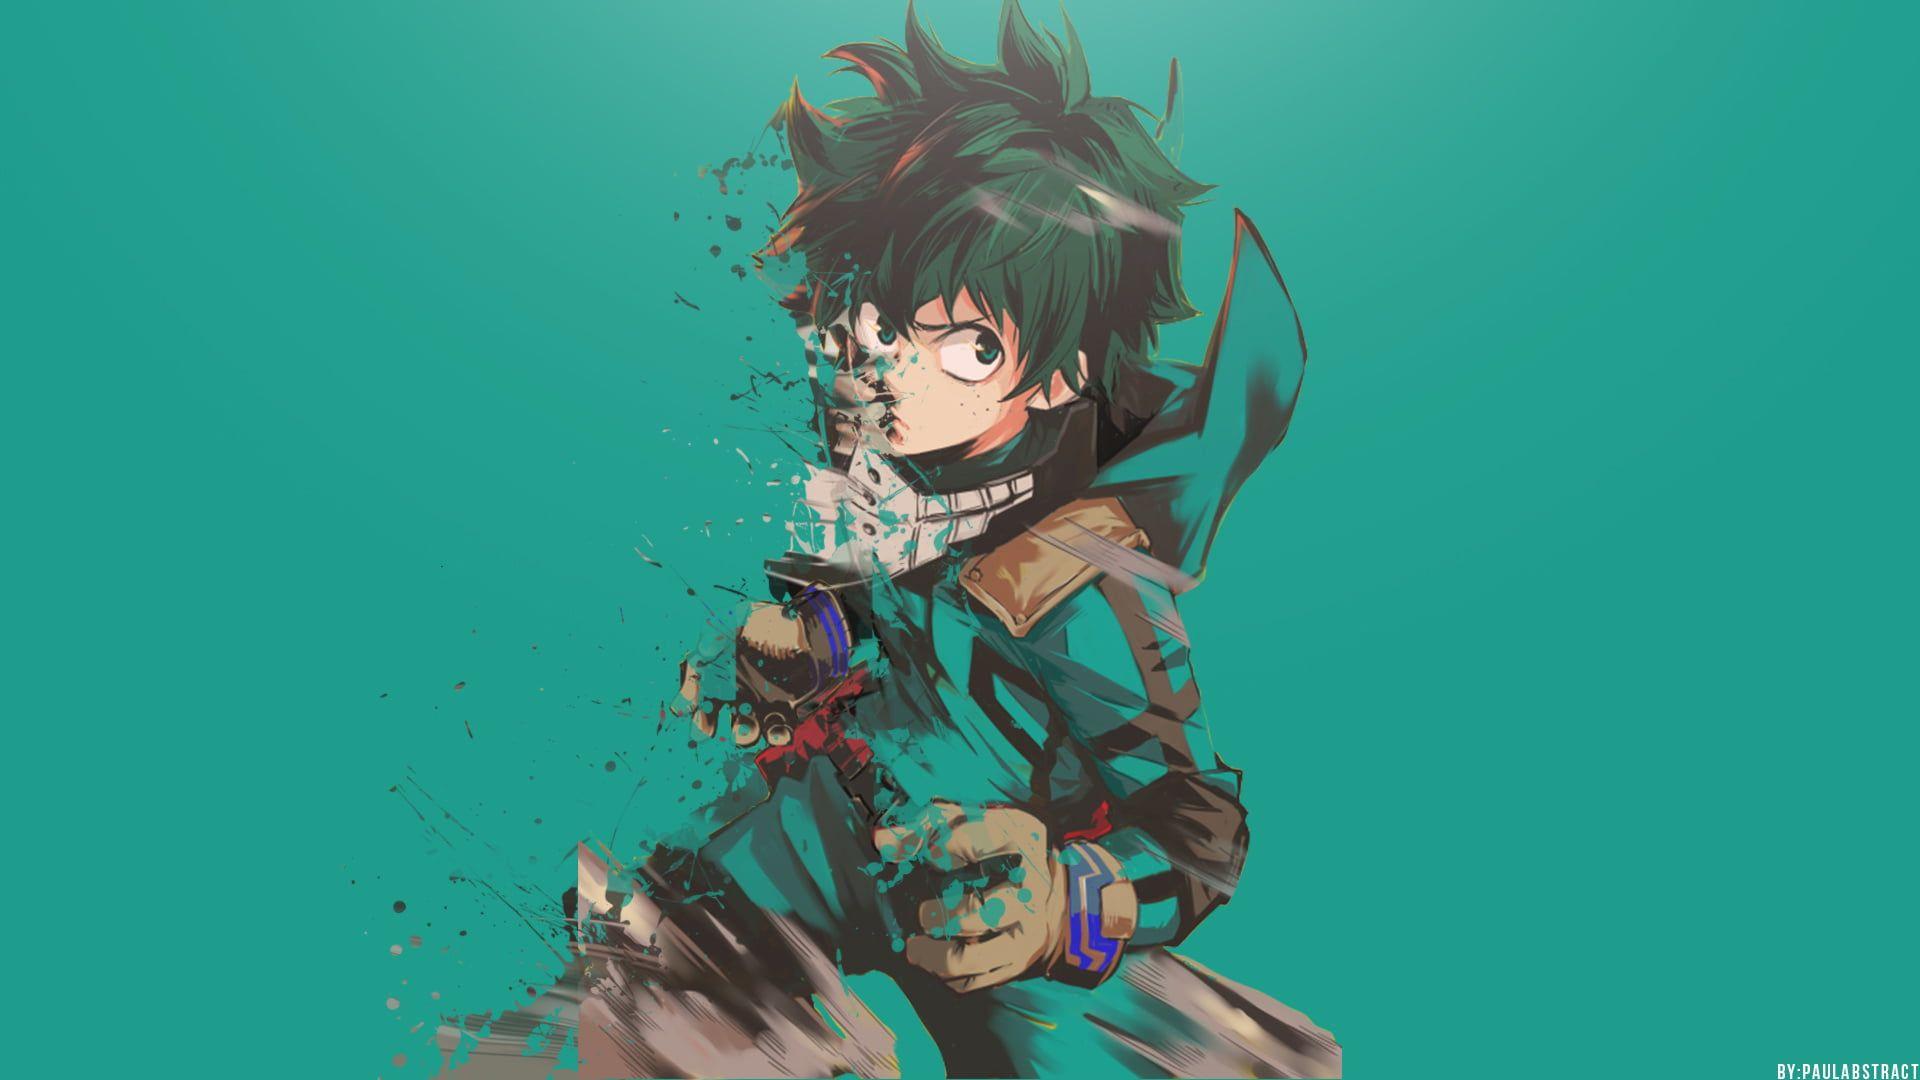 Izuku Midoriya Illustration Boku No Hero Academia Anime Midoriya Izuku Green Hair Digital Art Artwork 1080p Wallpaper Hero Wallpaper Anime Anime Wallpaper